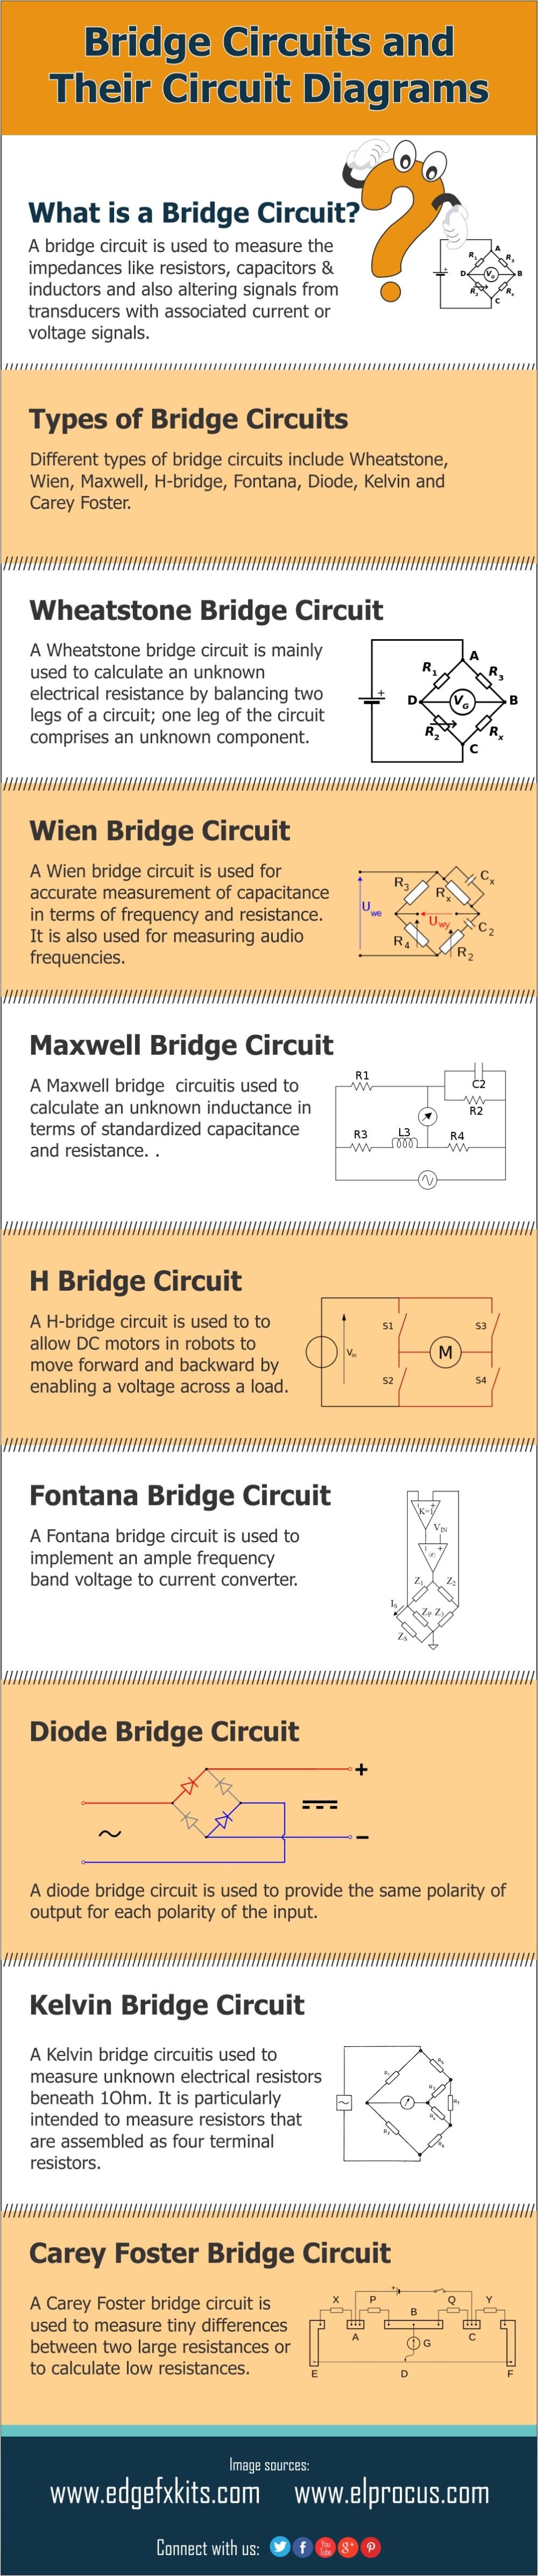 medium resolution of different types of bridge circuit and their circuit diagrams